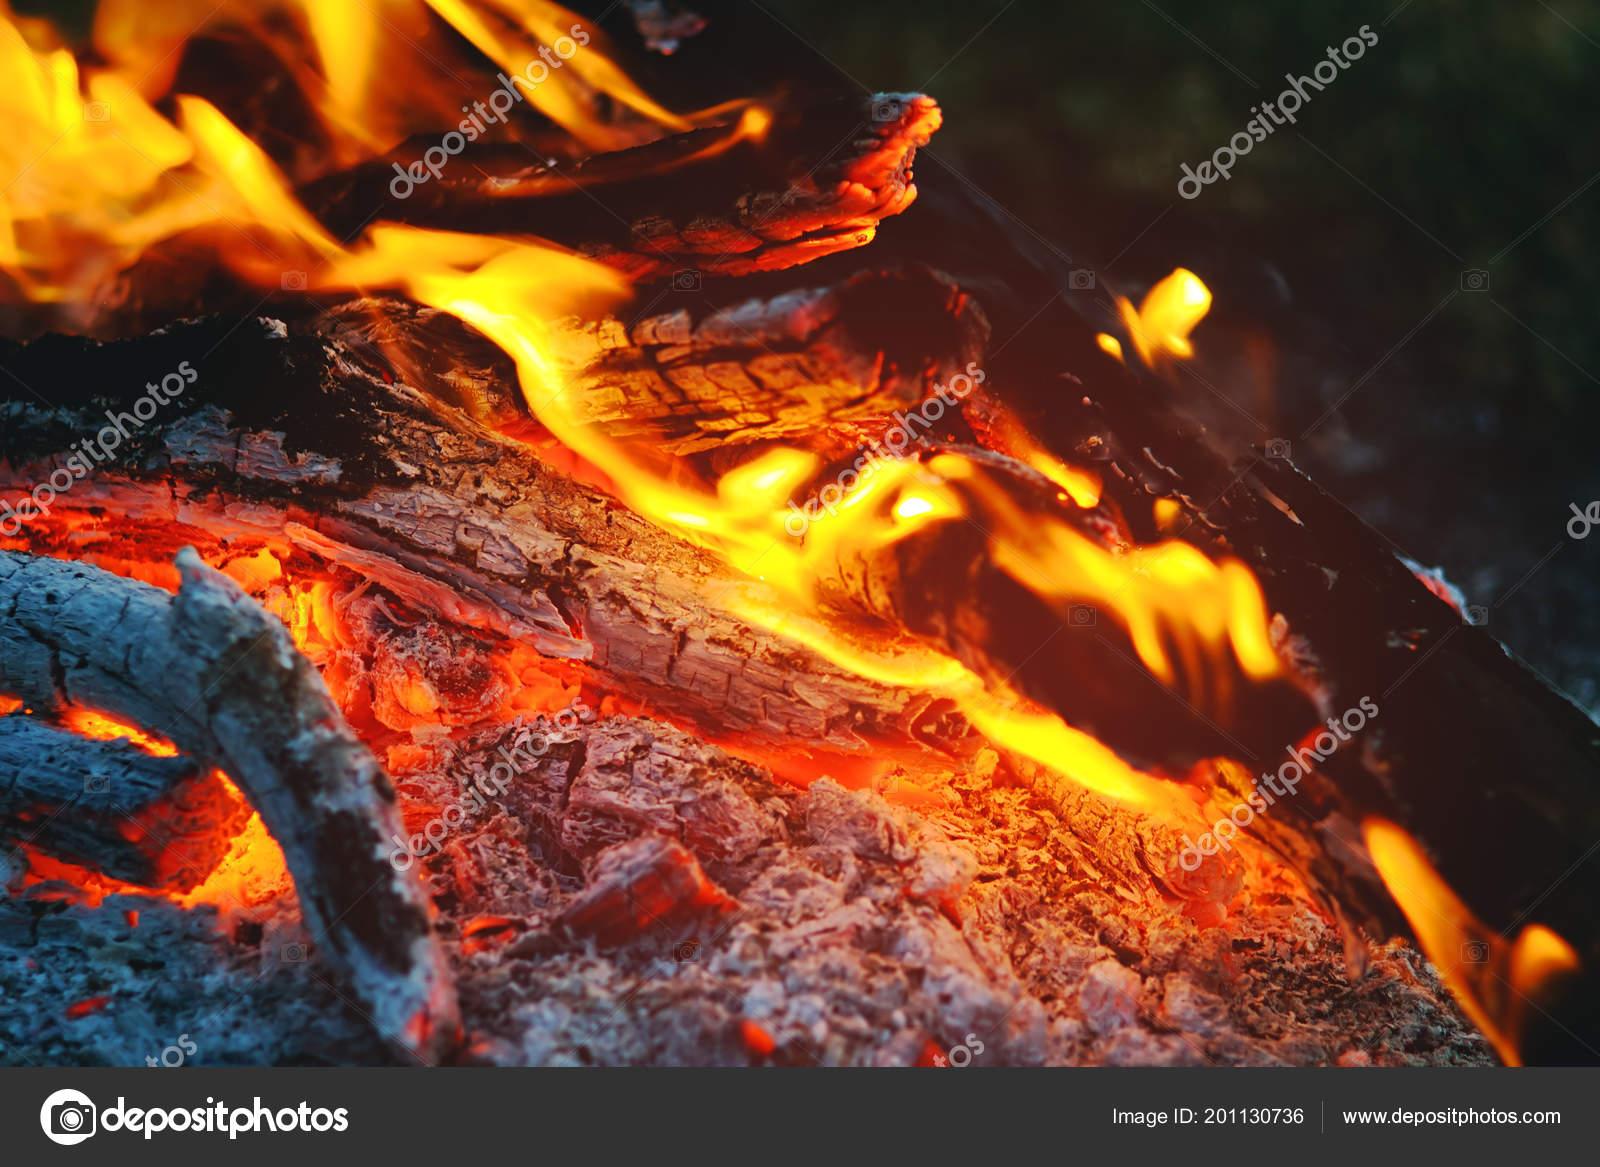 db38cd239ff Φλόγα Της Μια Φωτιά Που Καίει Σκοτεινή Νύχτα Και Αναμμένα ...